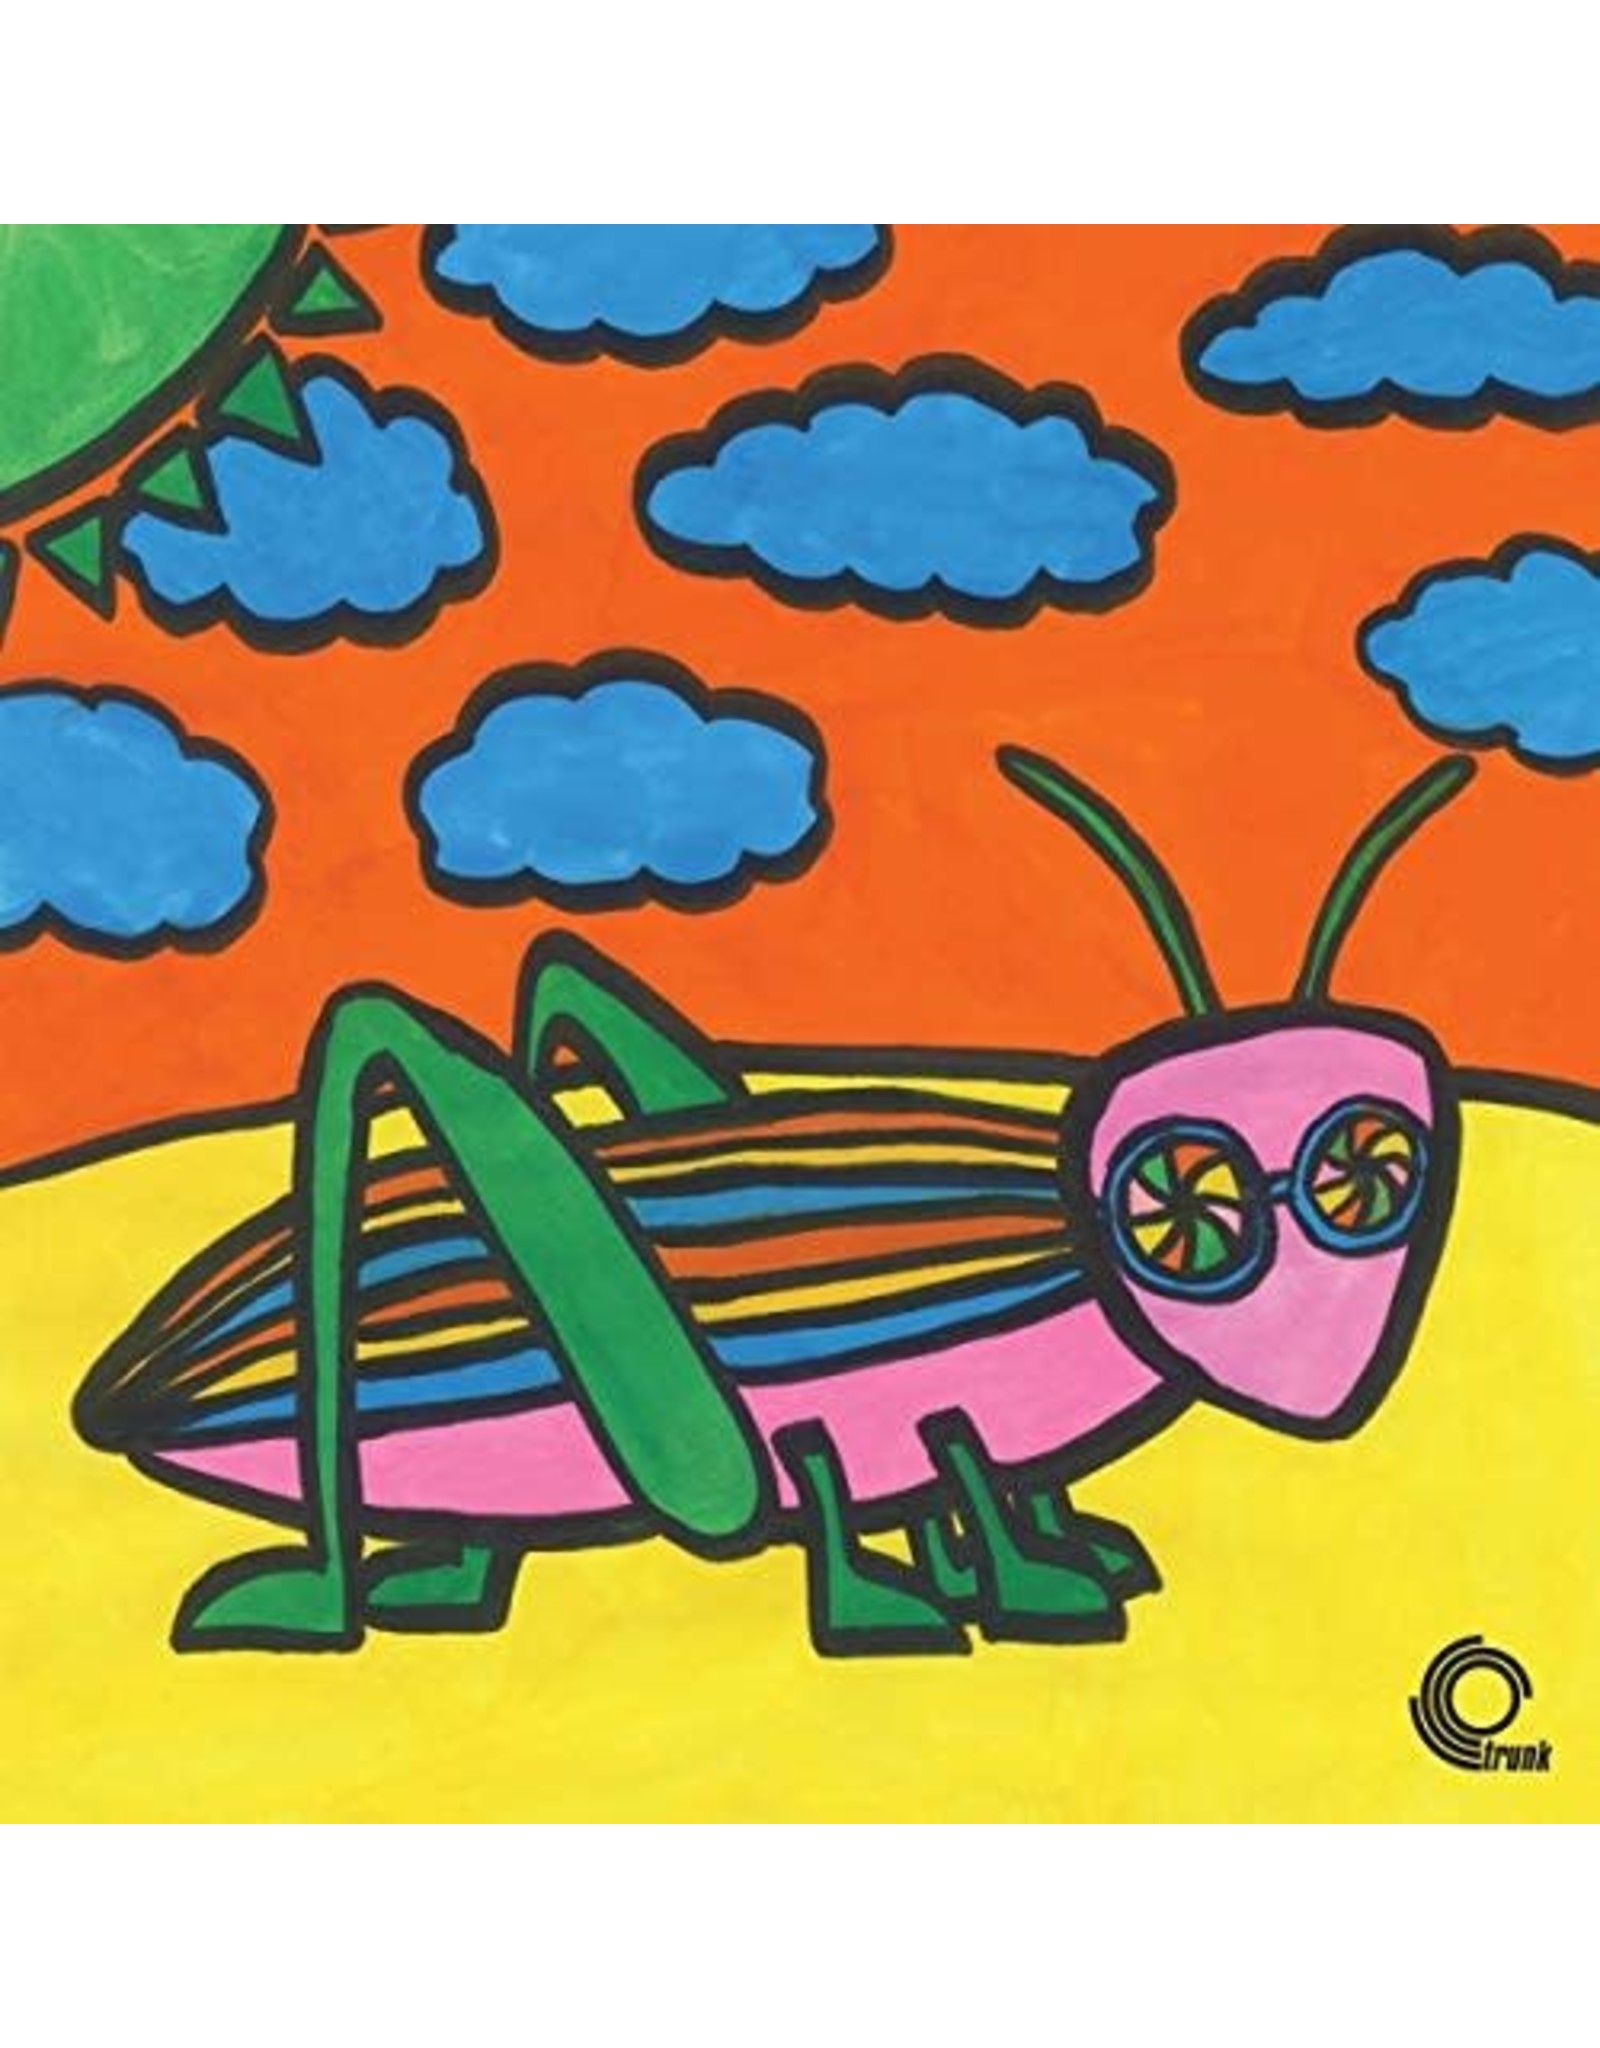 New Vinyl Crickets. Lots Of Crickets. And Jim Wilson - God's Chorus LP